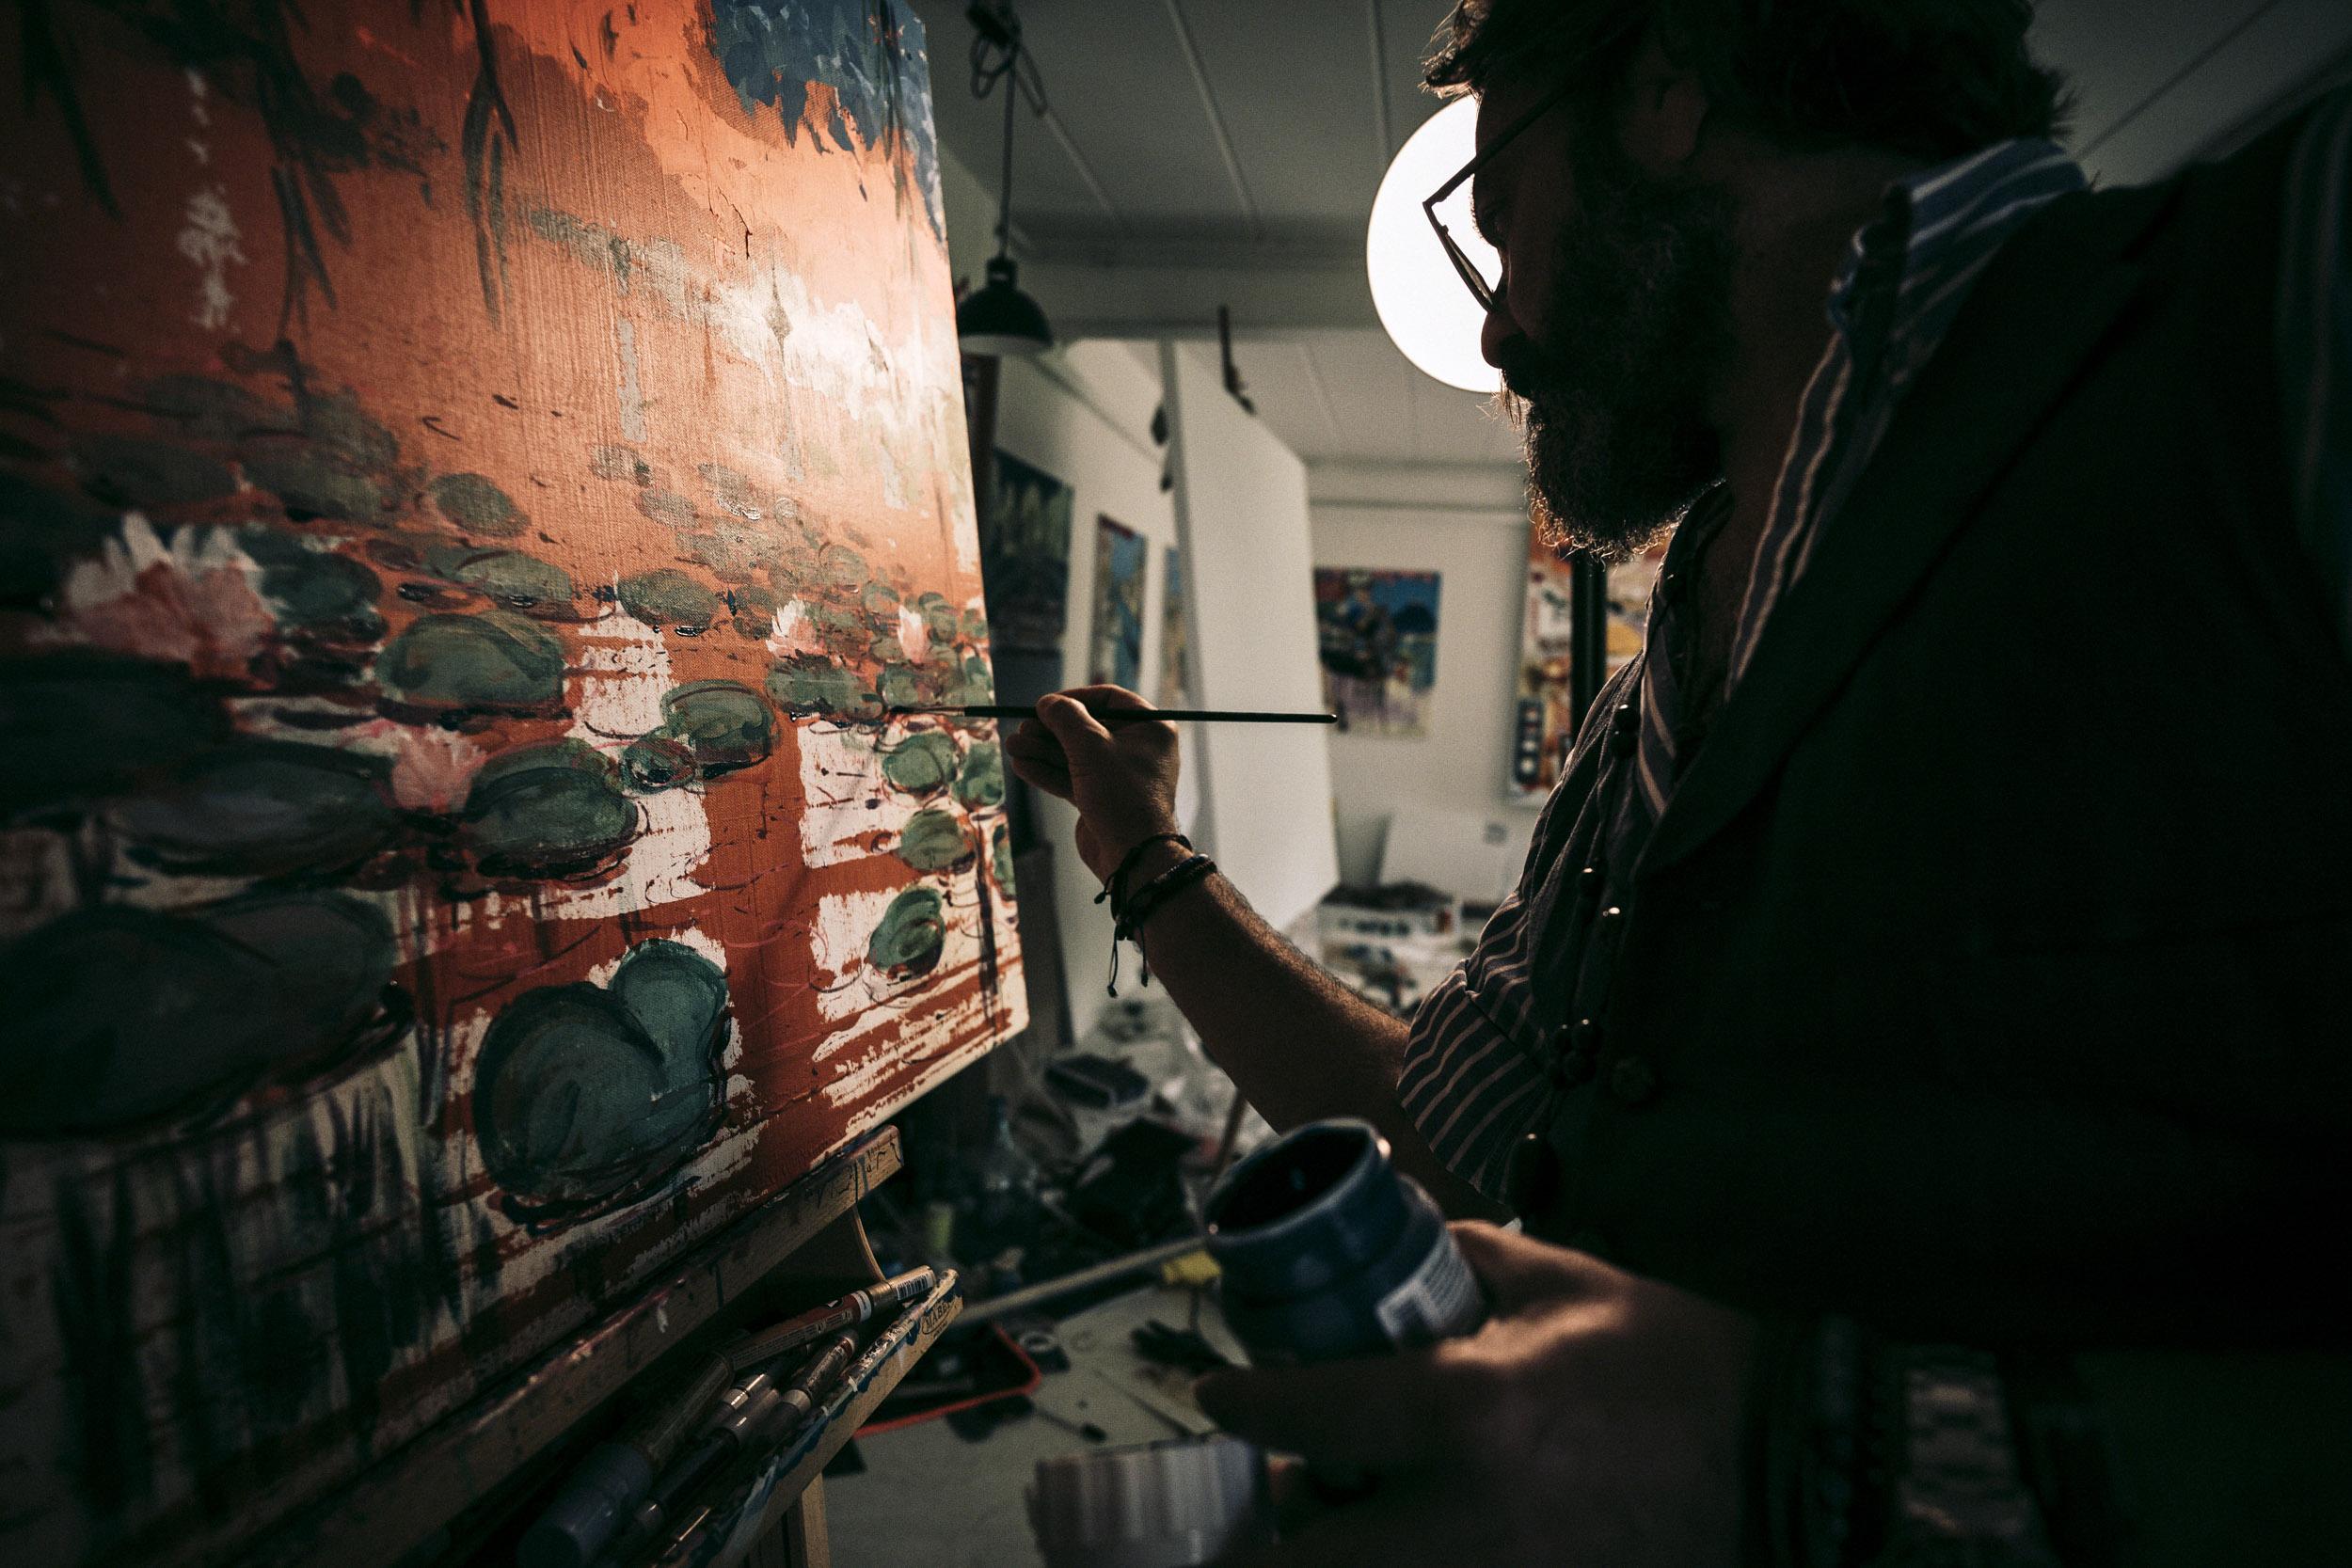 2018-SeifertUebler-Mauro-Bergonzoli-lifestyle-portrait-artist-photography-004.jpg